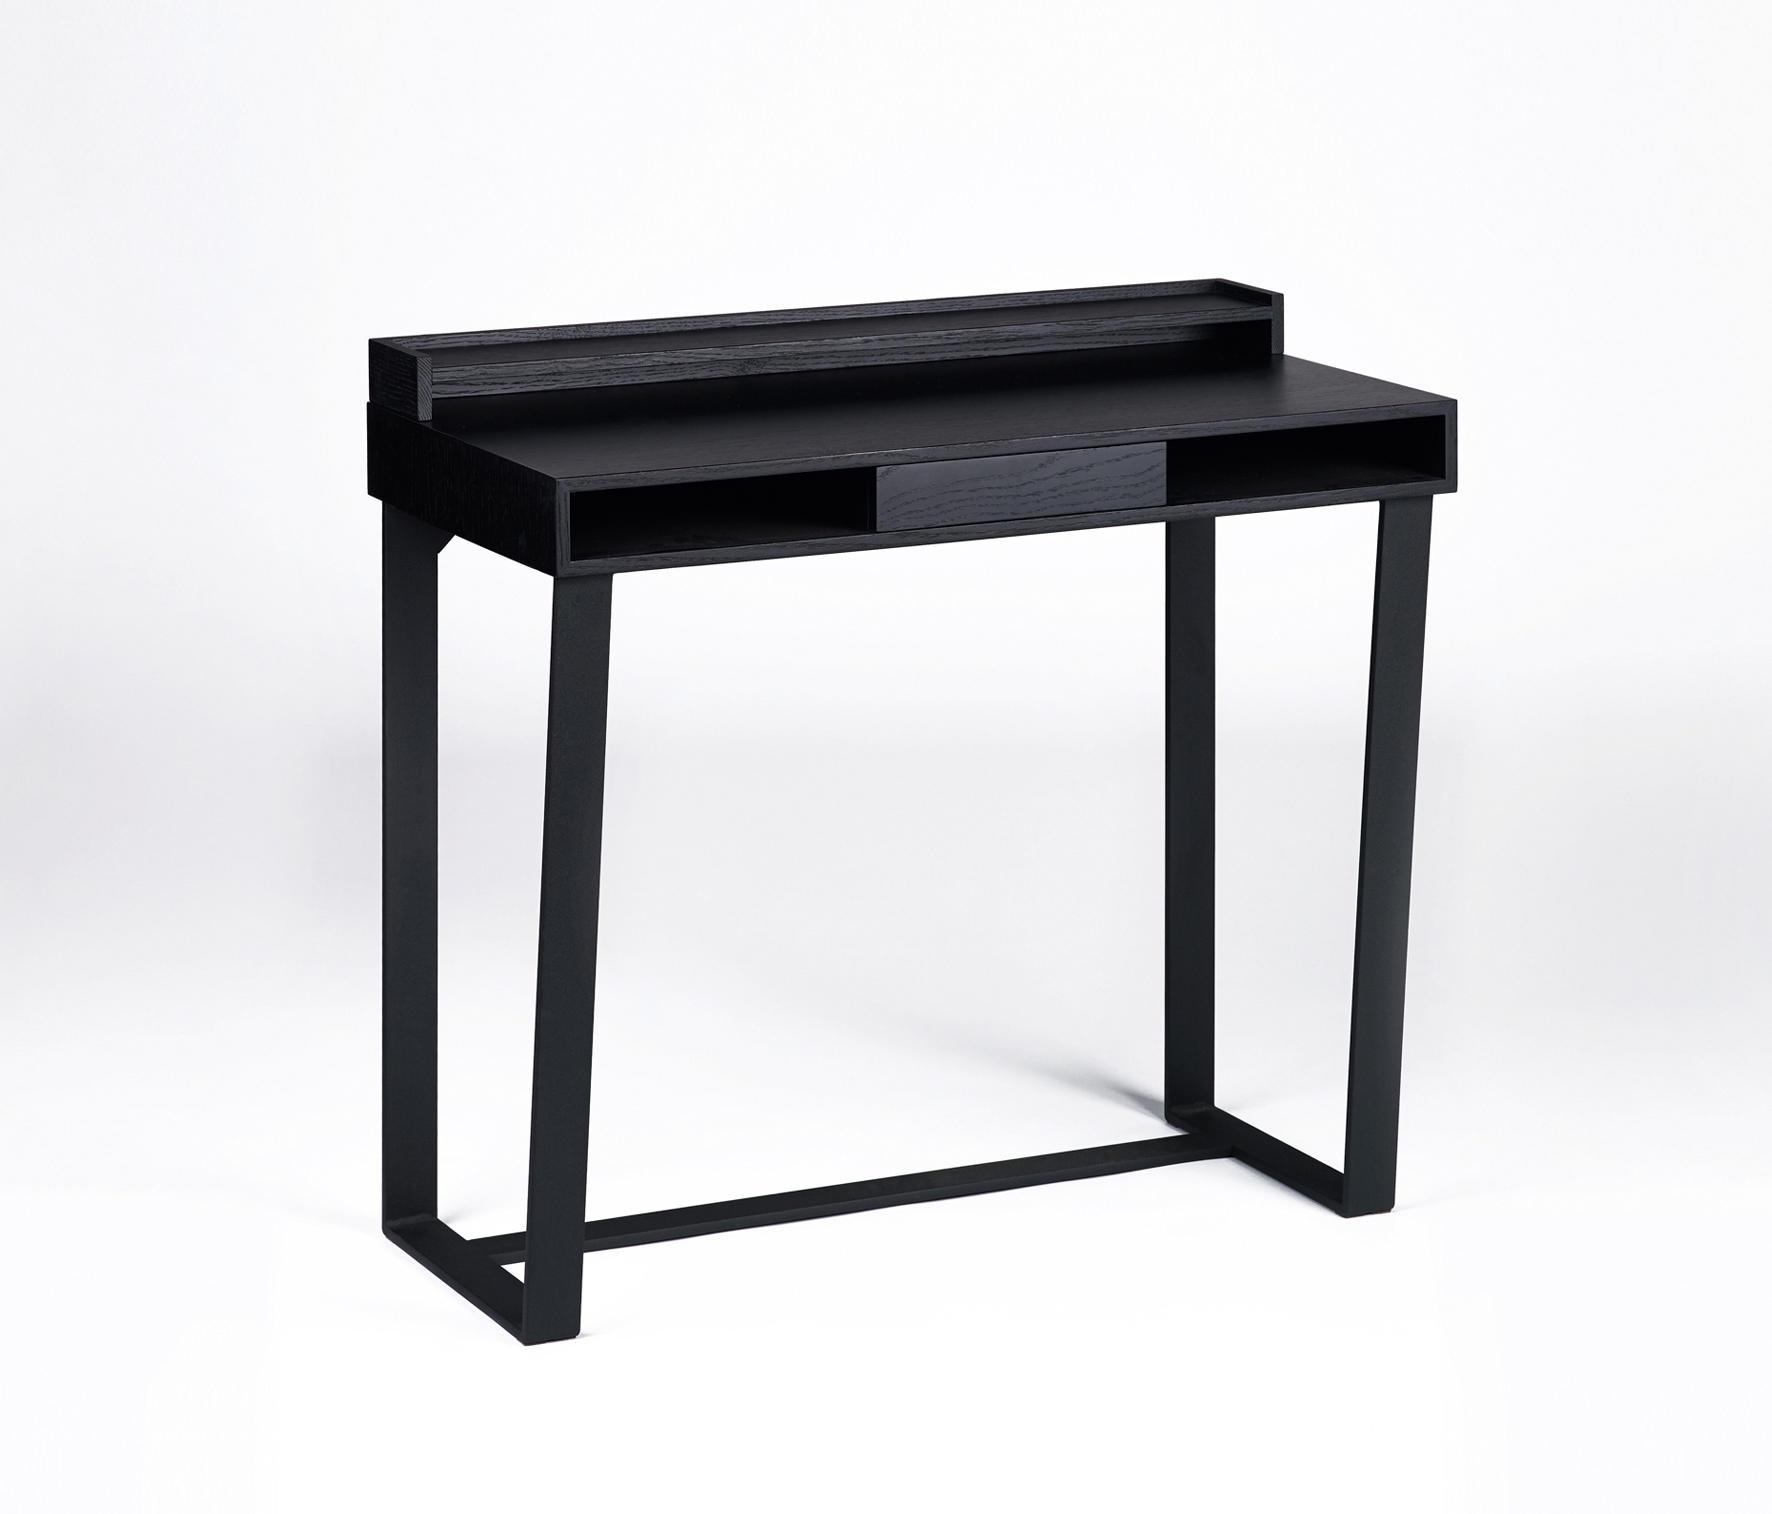 Harvey dressing tables from lambert architonic for Harvey windows price list